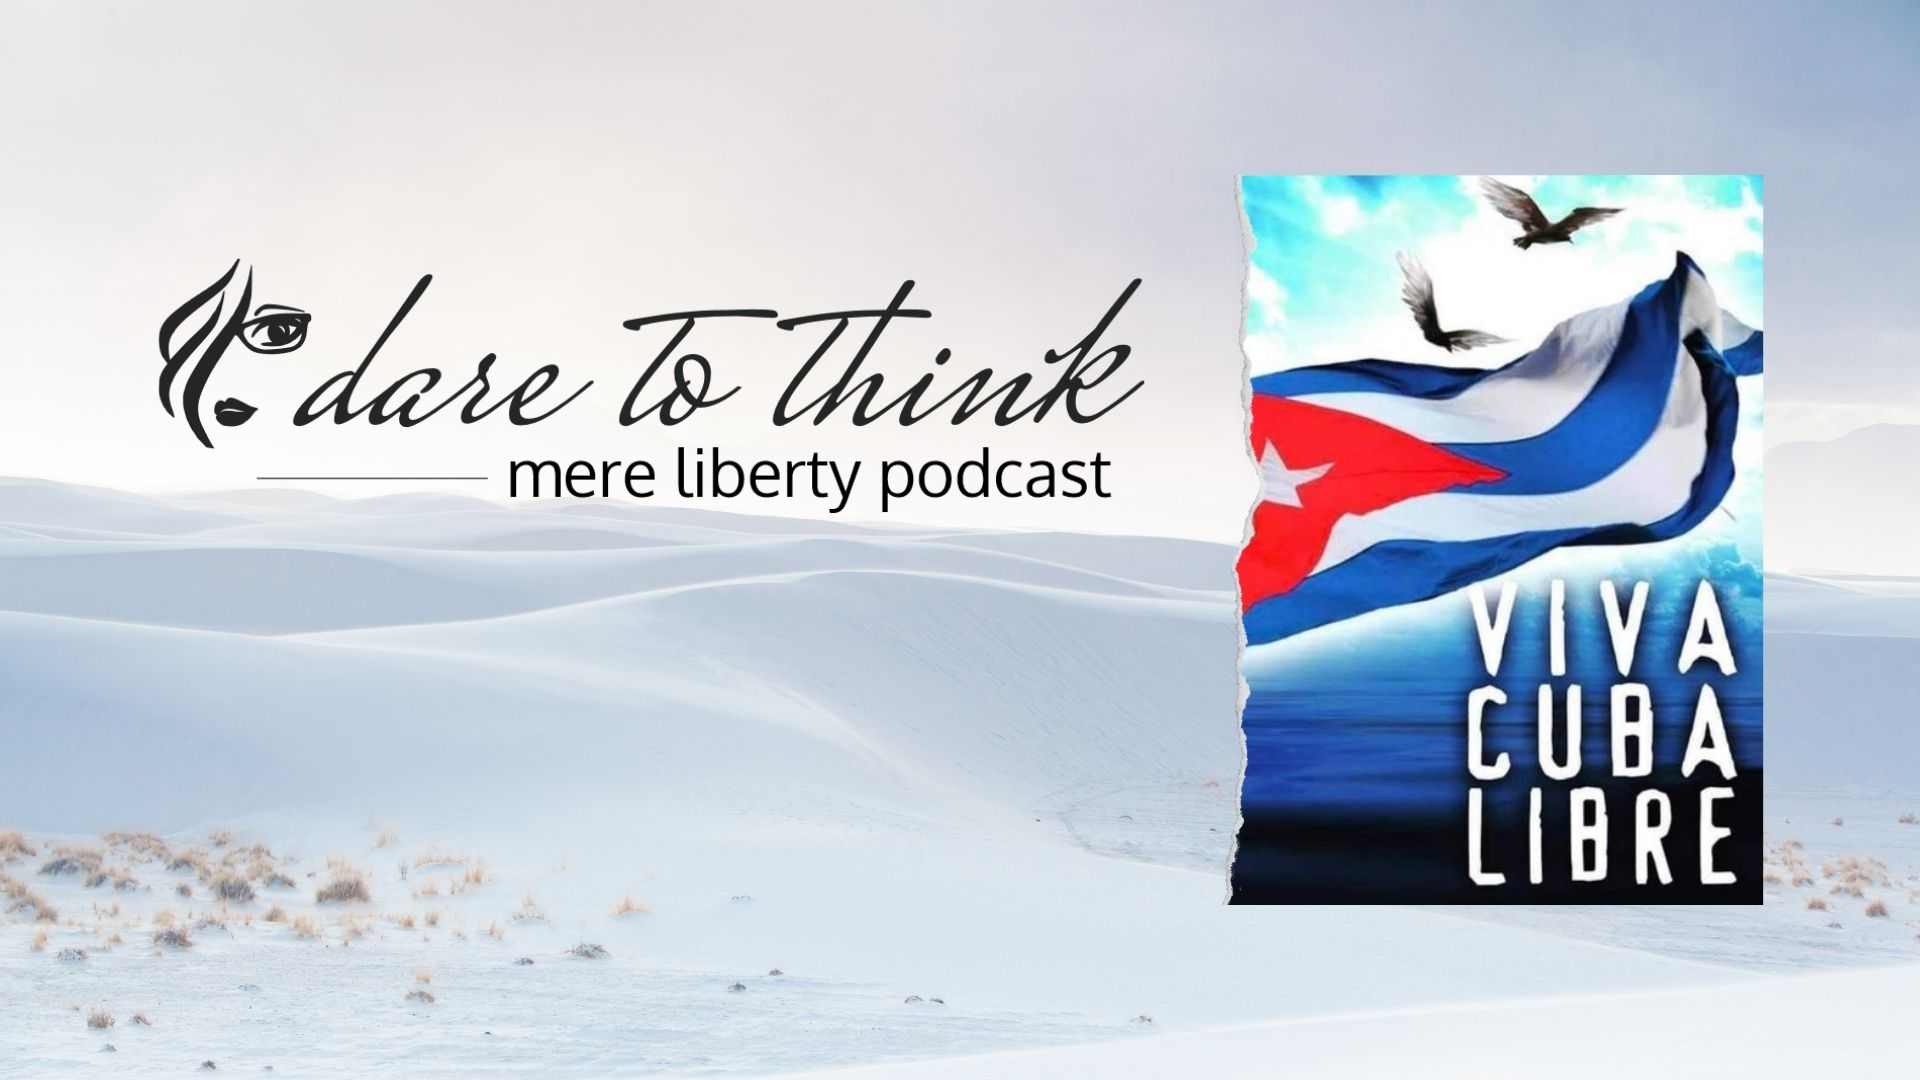 cuban liberty